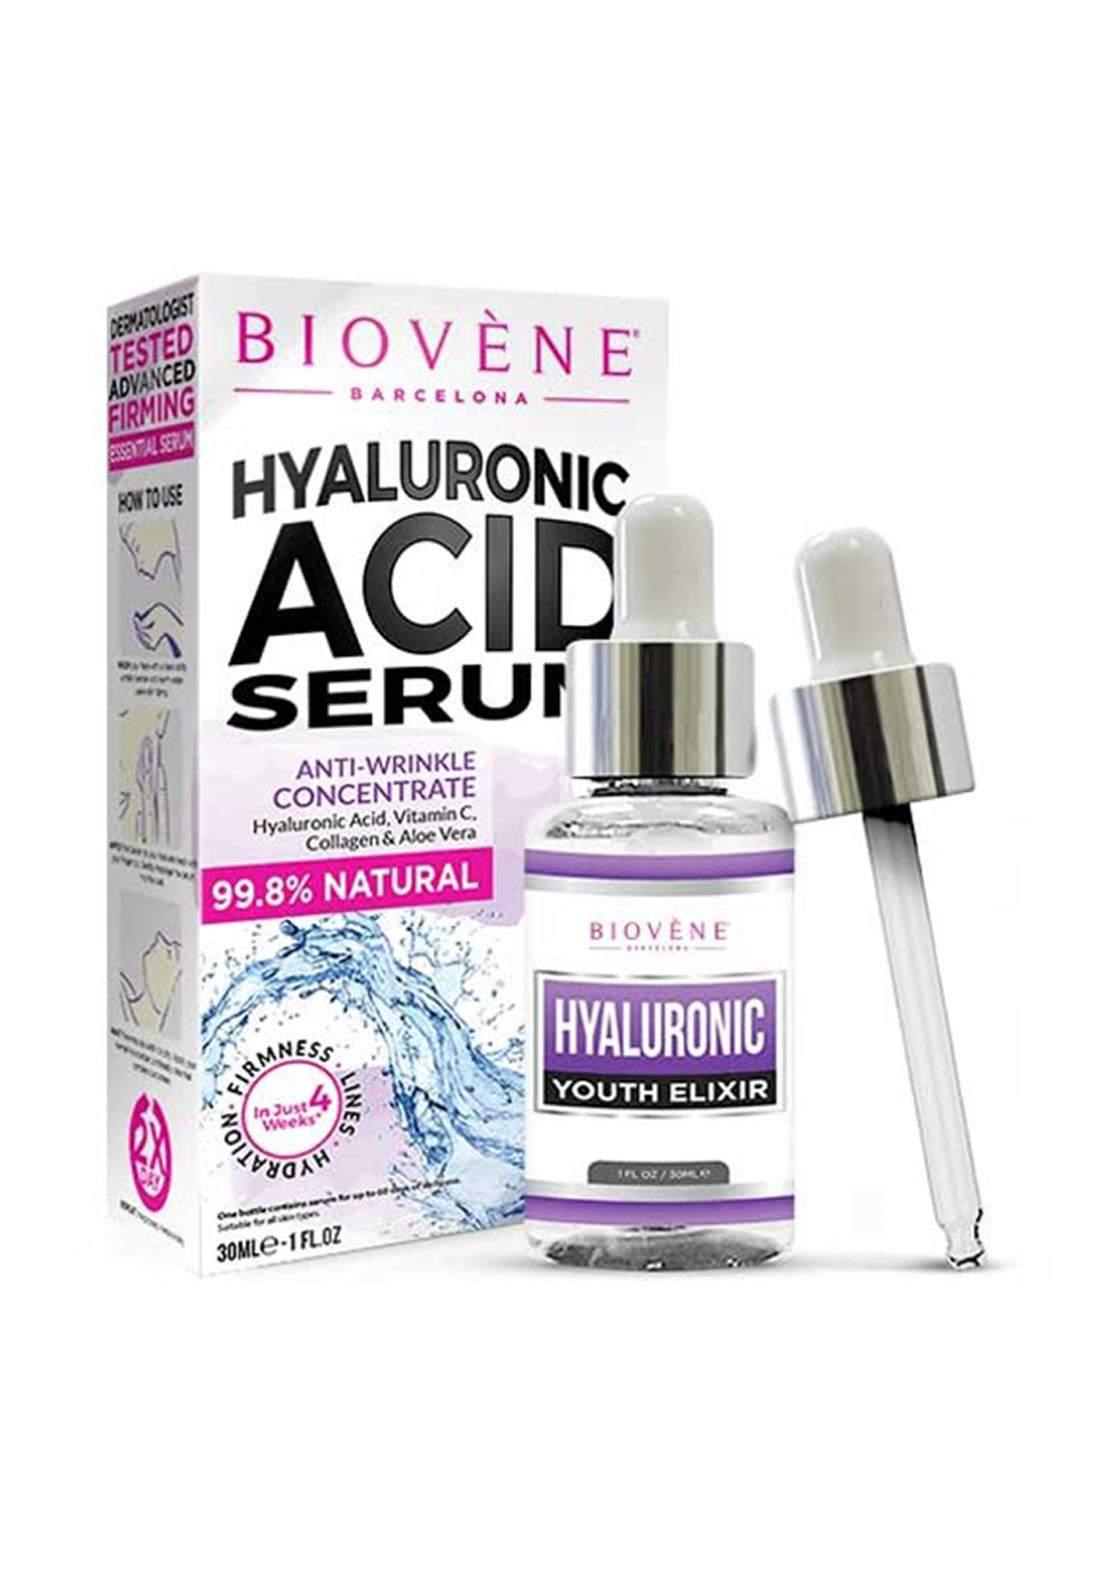 Biovene Hyaluronic Acid Serum - 12ml سيرم البشرة